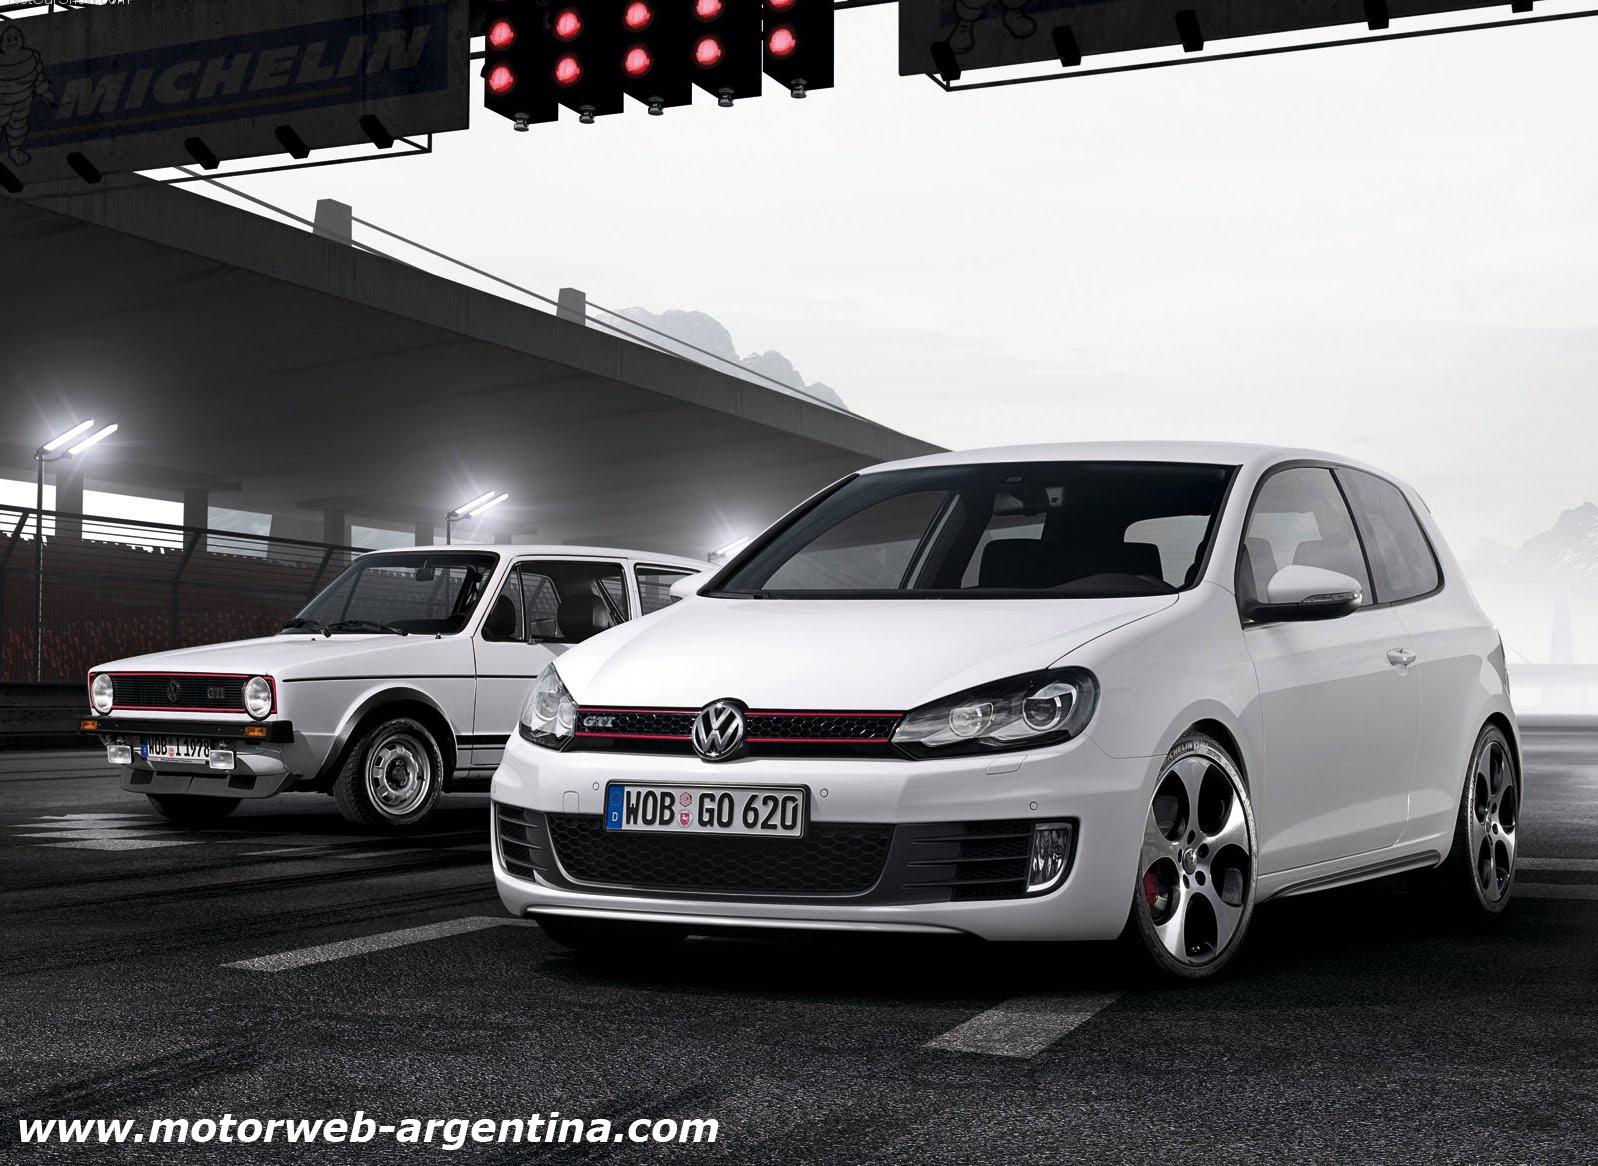 http://1.bp.blogspot.com/_aYHy9i_CR0Y/TFqnk1OhINI/AAAAAAAAEc4/BmwSkk2k7TI/s1600/Volkswagen-Golf_GTI_Concept_2008_1600x1200_wallpaper_02.jpg